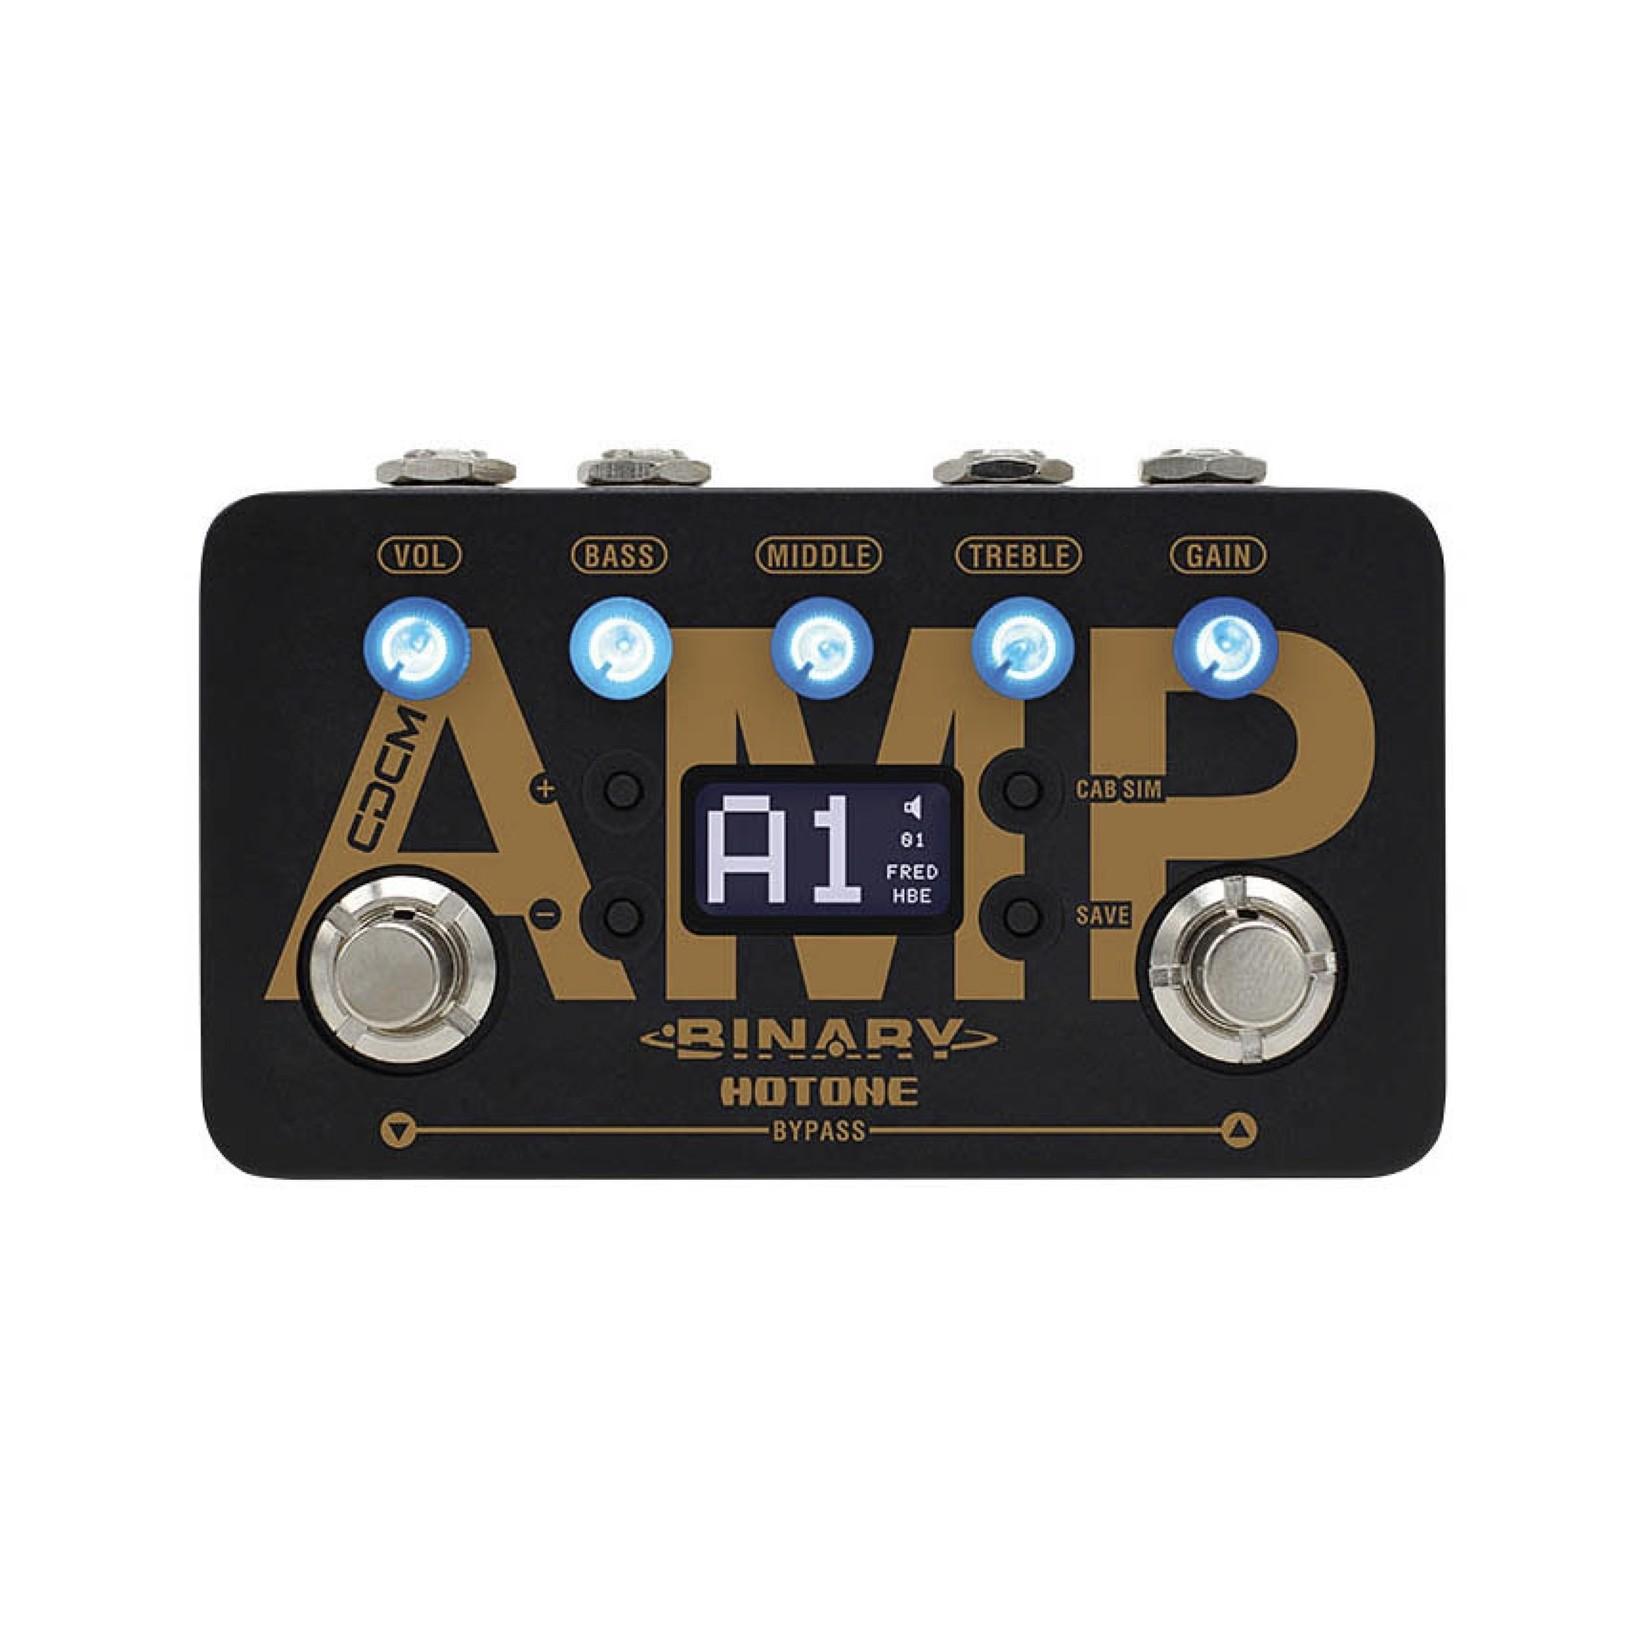 Hotone Hotone Binary AMP CDCM Amplifier Simulator Effects Pedal